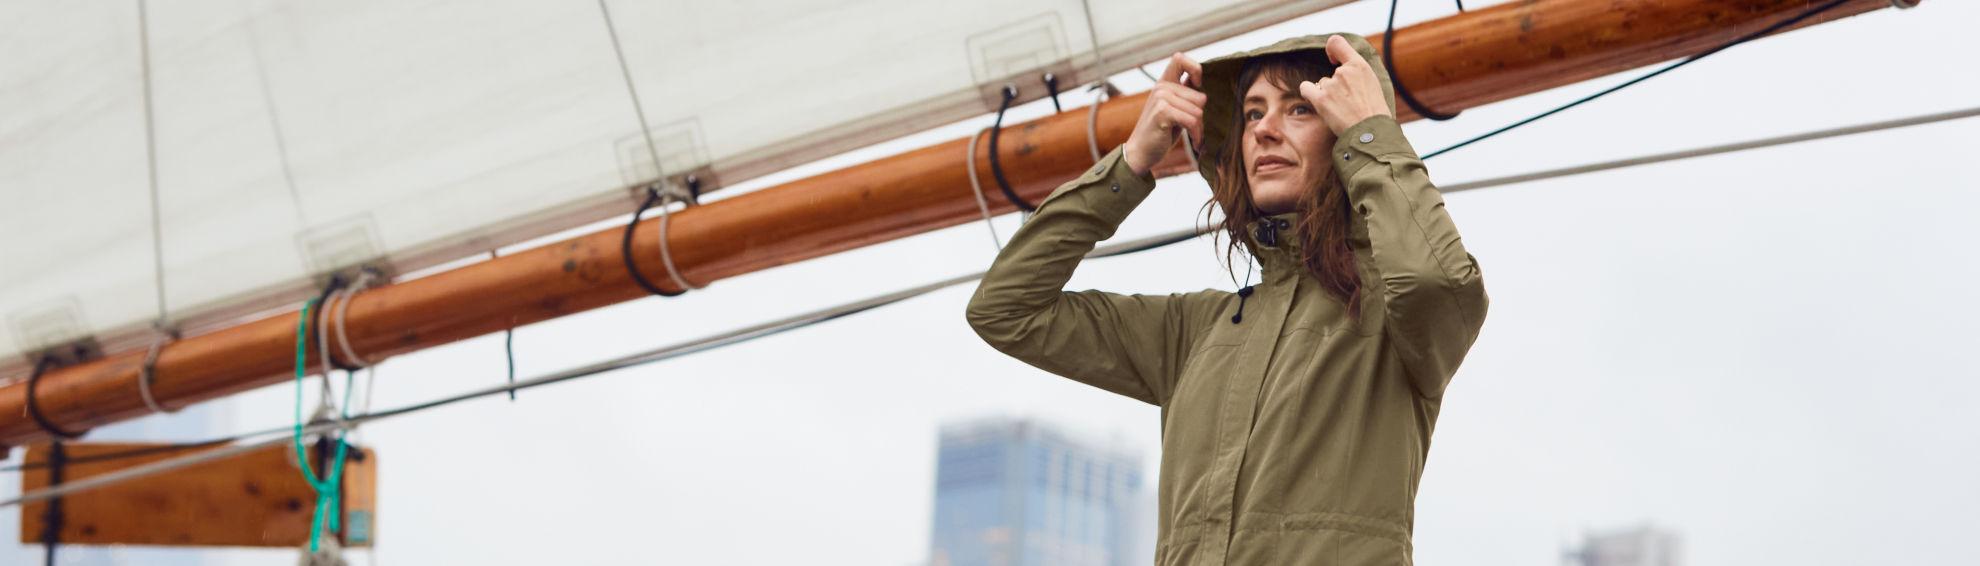 Woman wearing raincoat on a. sailboat